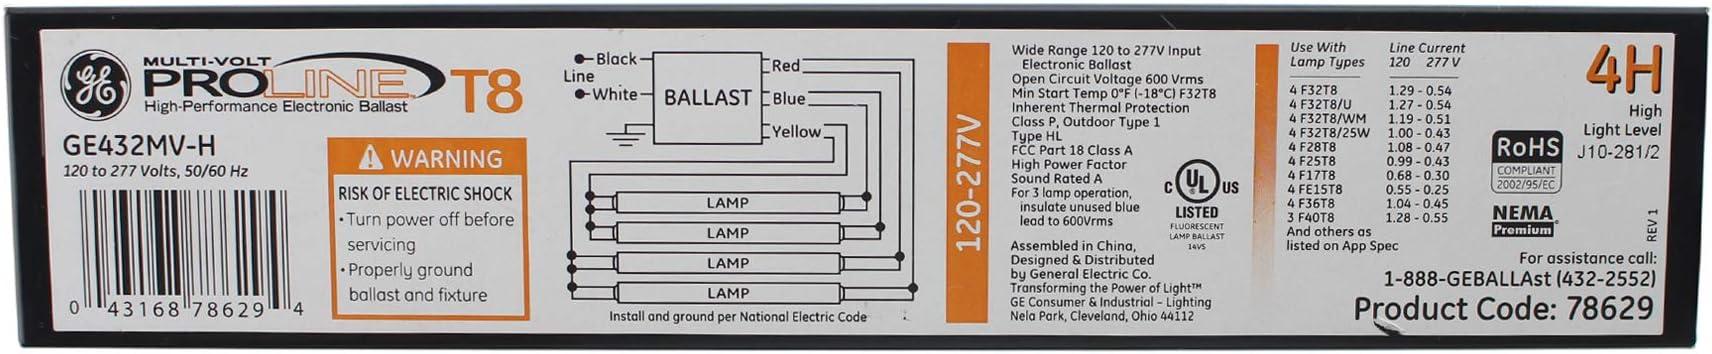 4 lamp electronic ballast wiring diagram general electric ge432mv h 4 lamp electronic ballast  t8  120 277v  ge432mv h 4 lamp electronic ballast  t8